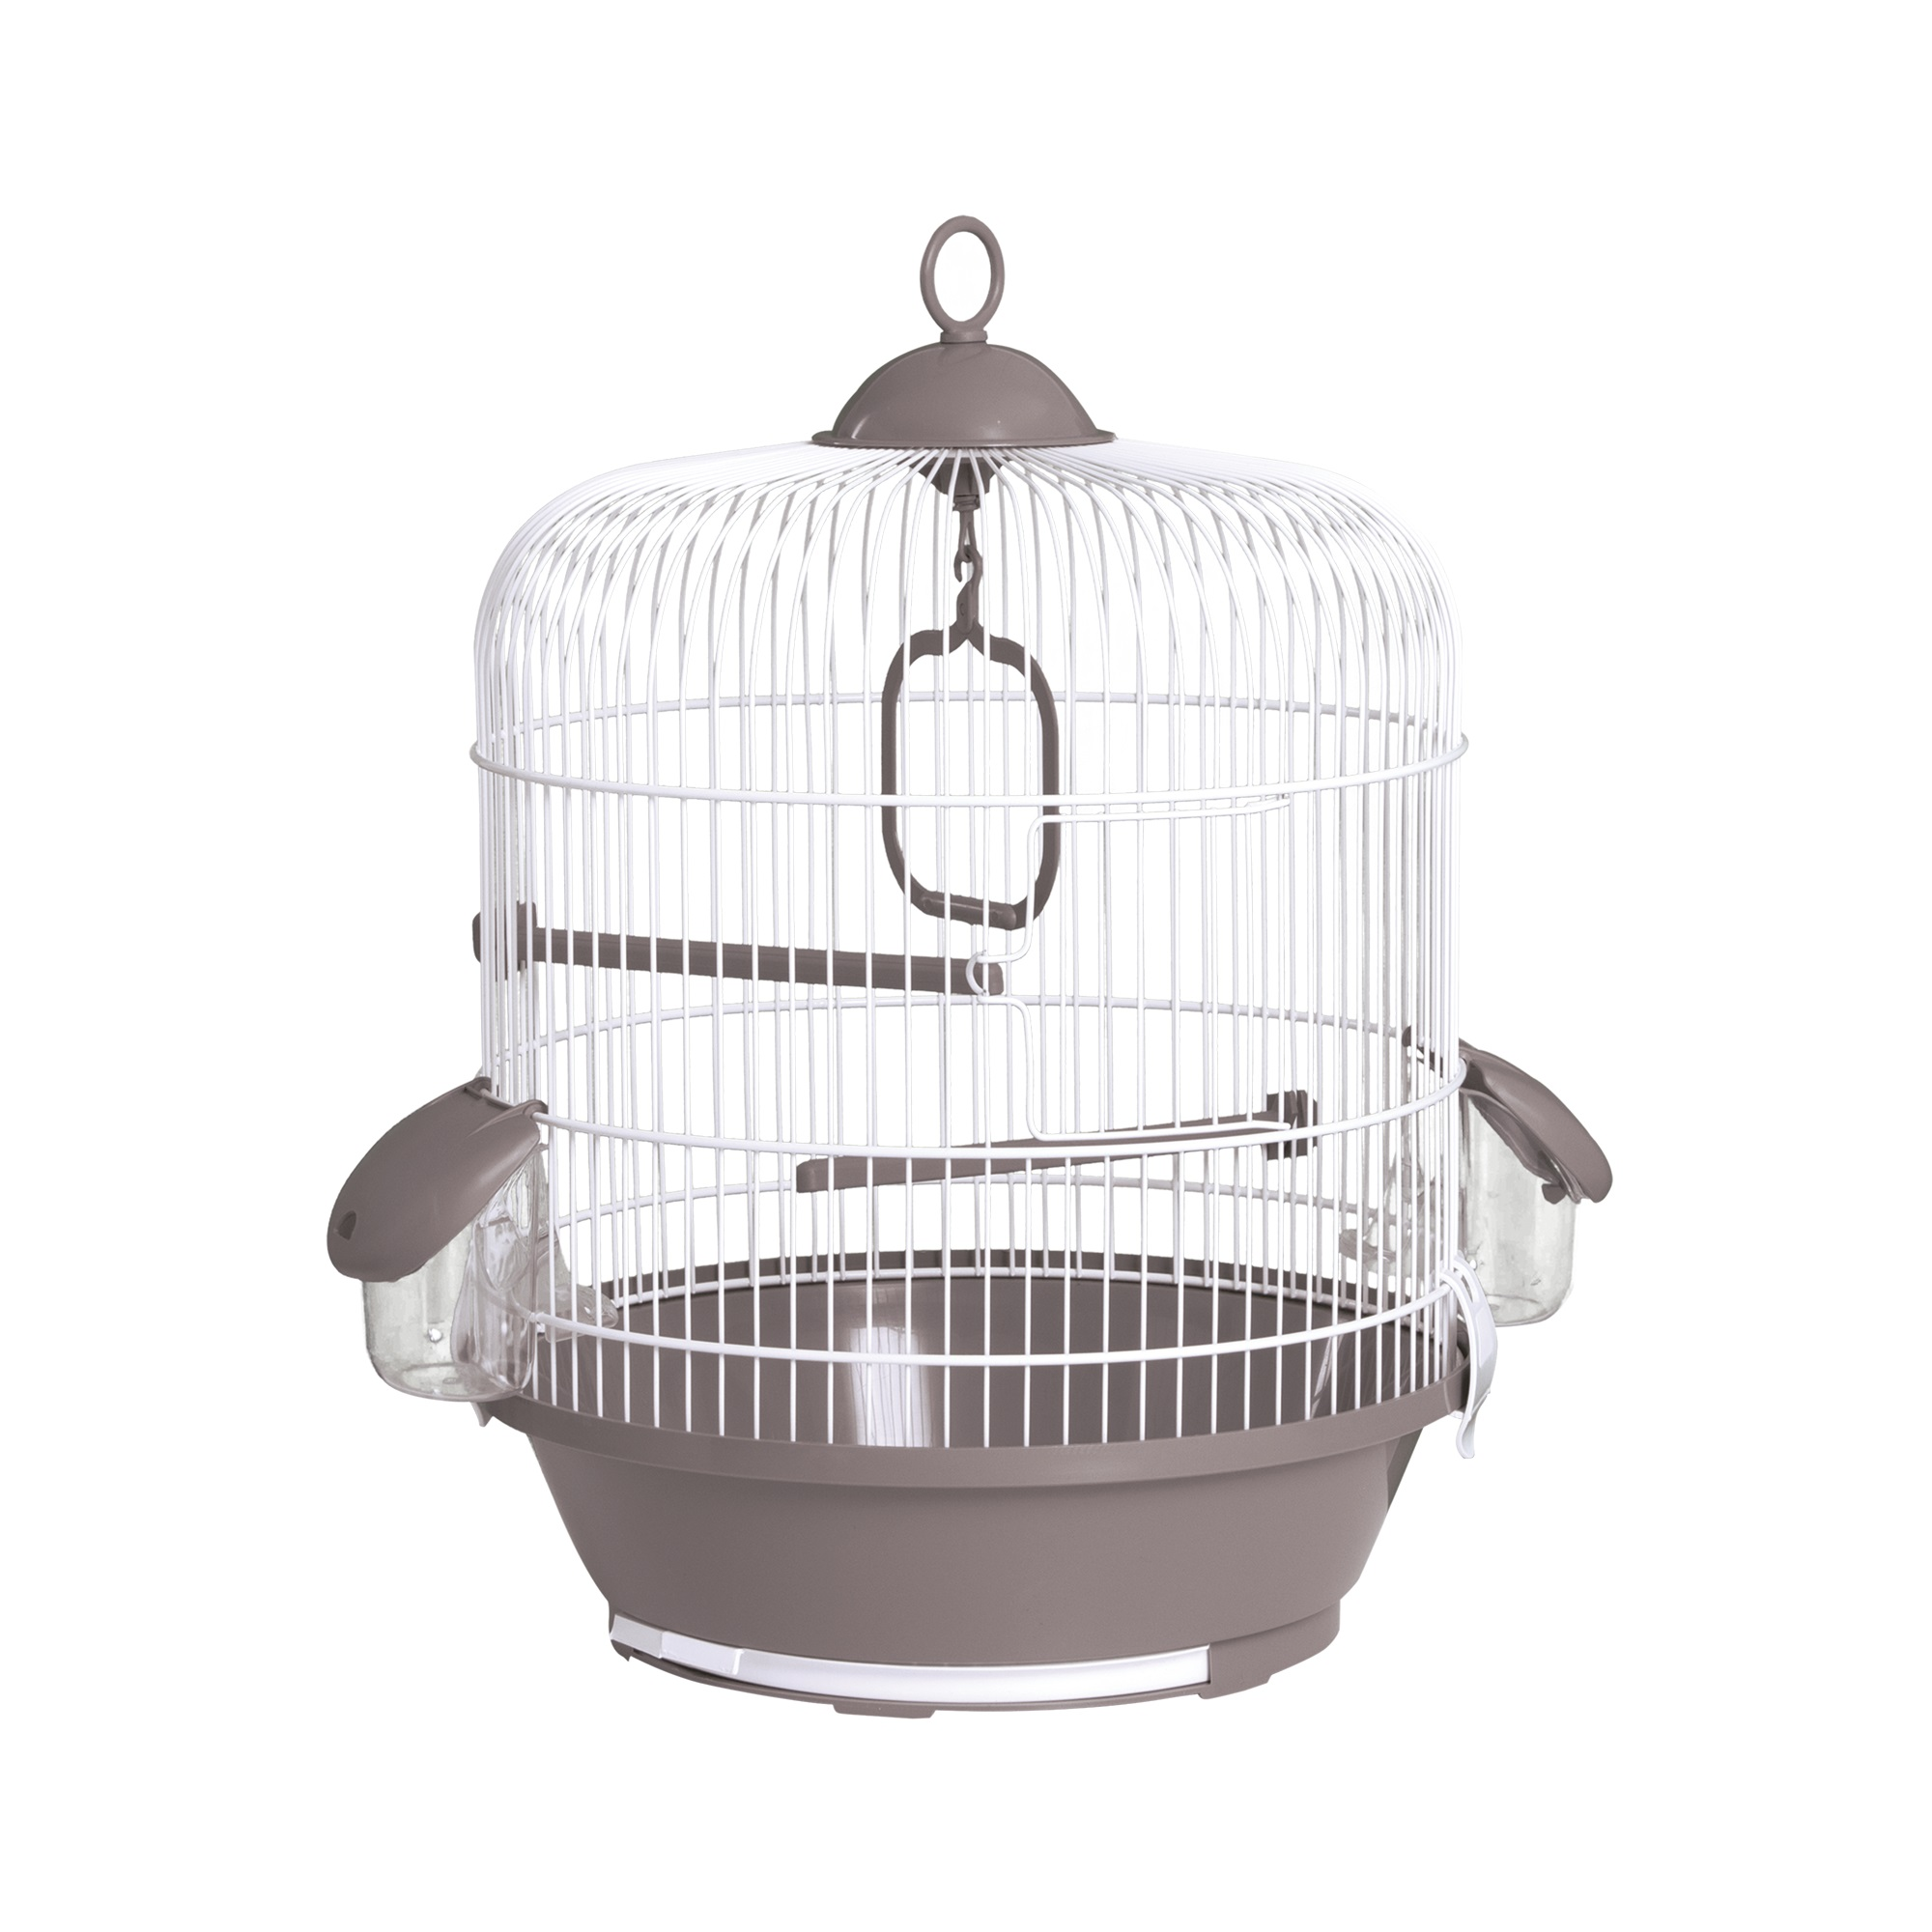 Клетка для птиц Voltrega 001716BG